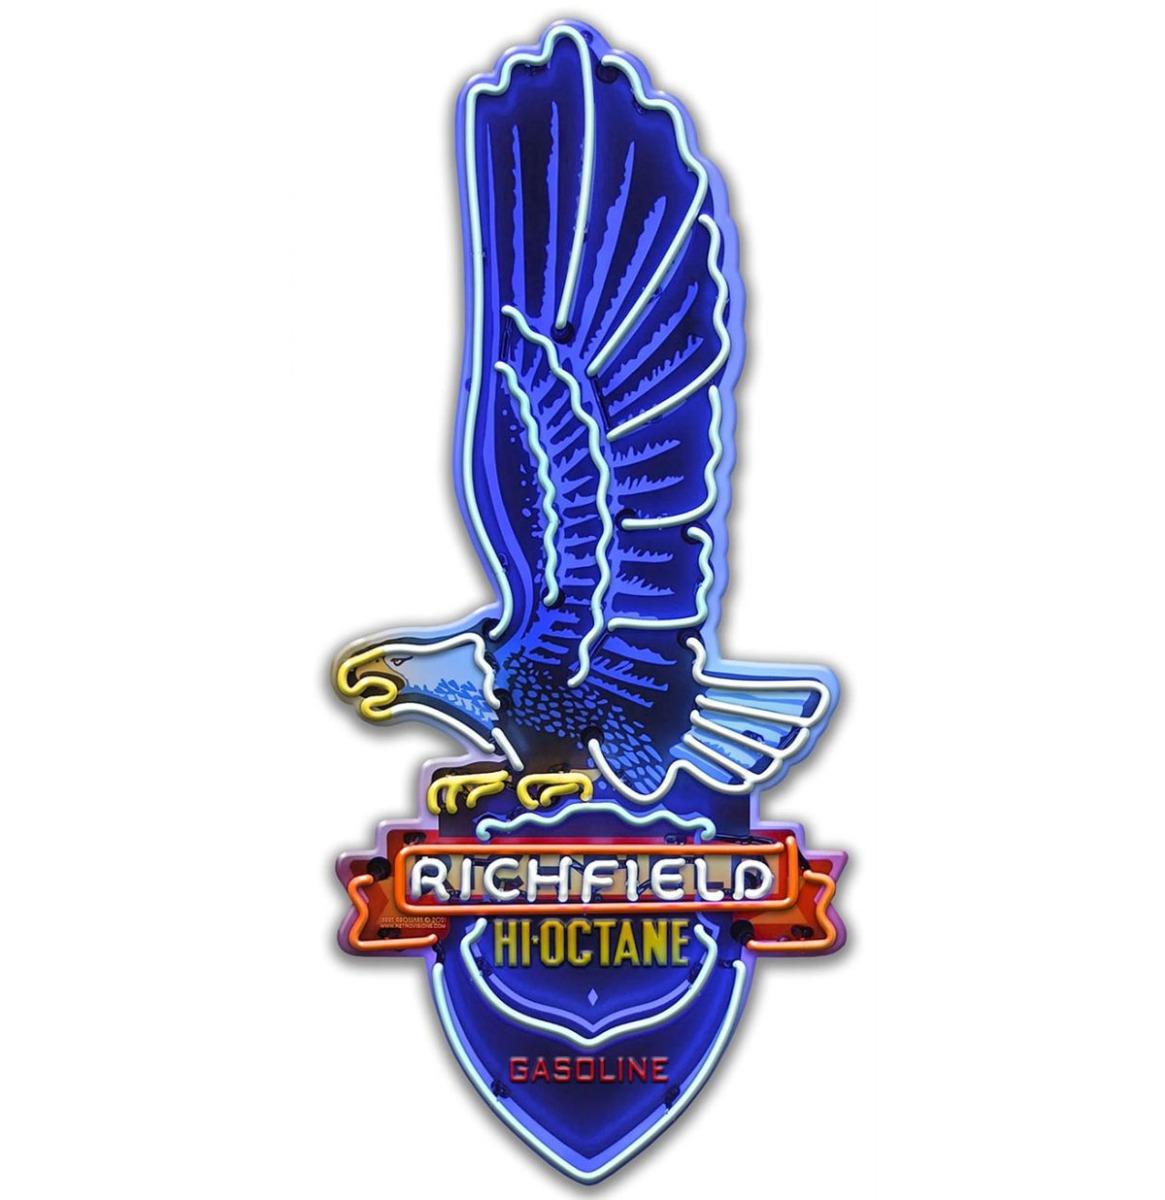 Richfield Hi-Octane Gasoline Eagle Neon Metalen Bord 46 x 20 cm